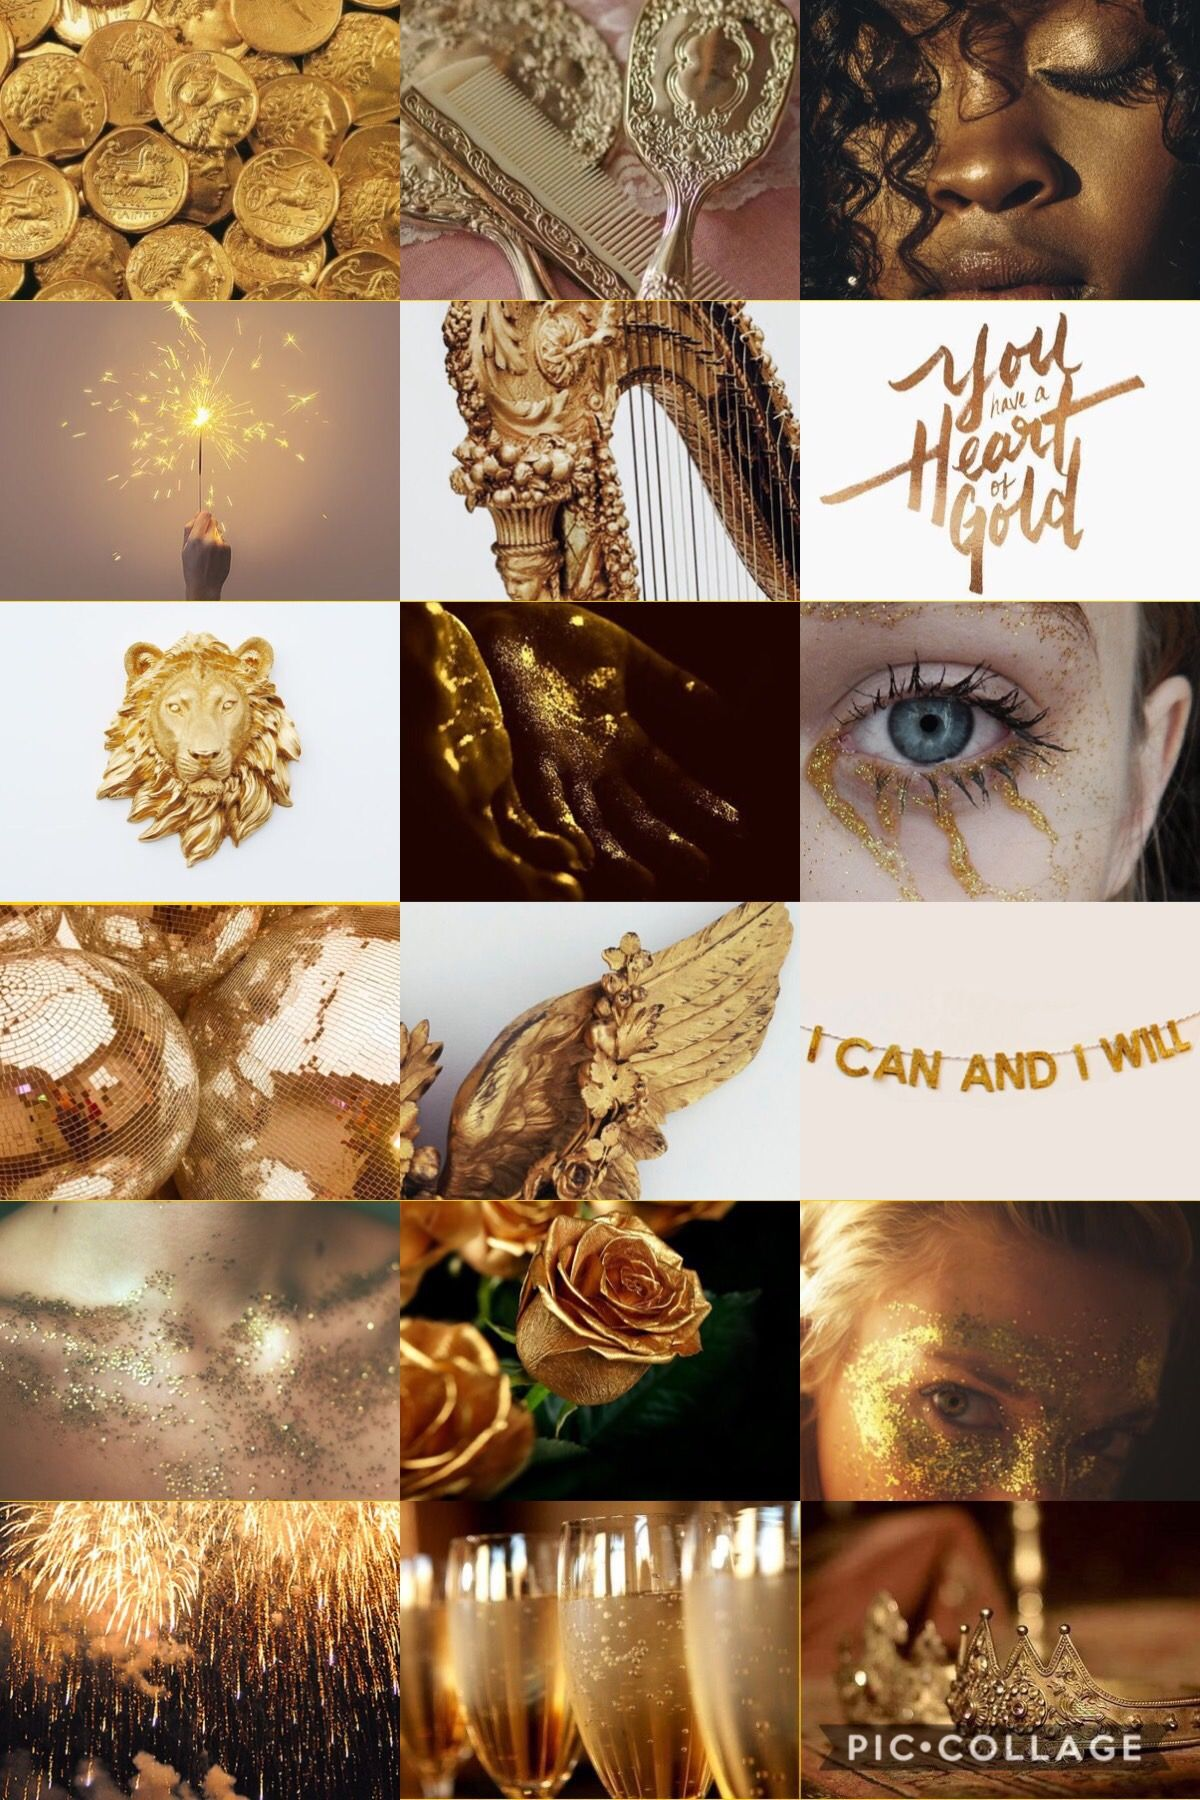 Pin By Aisthetikos On Gold Aesthetic Collage Zodiac Art Gold Aesthetic